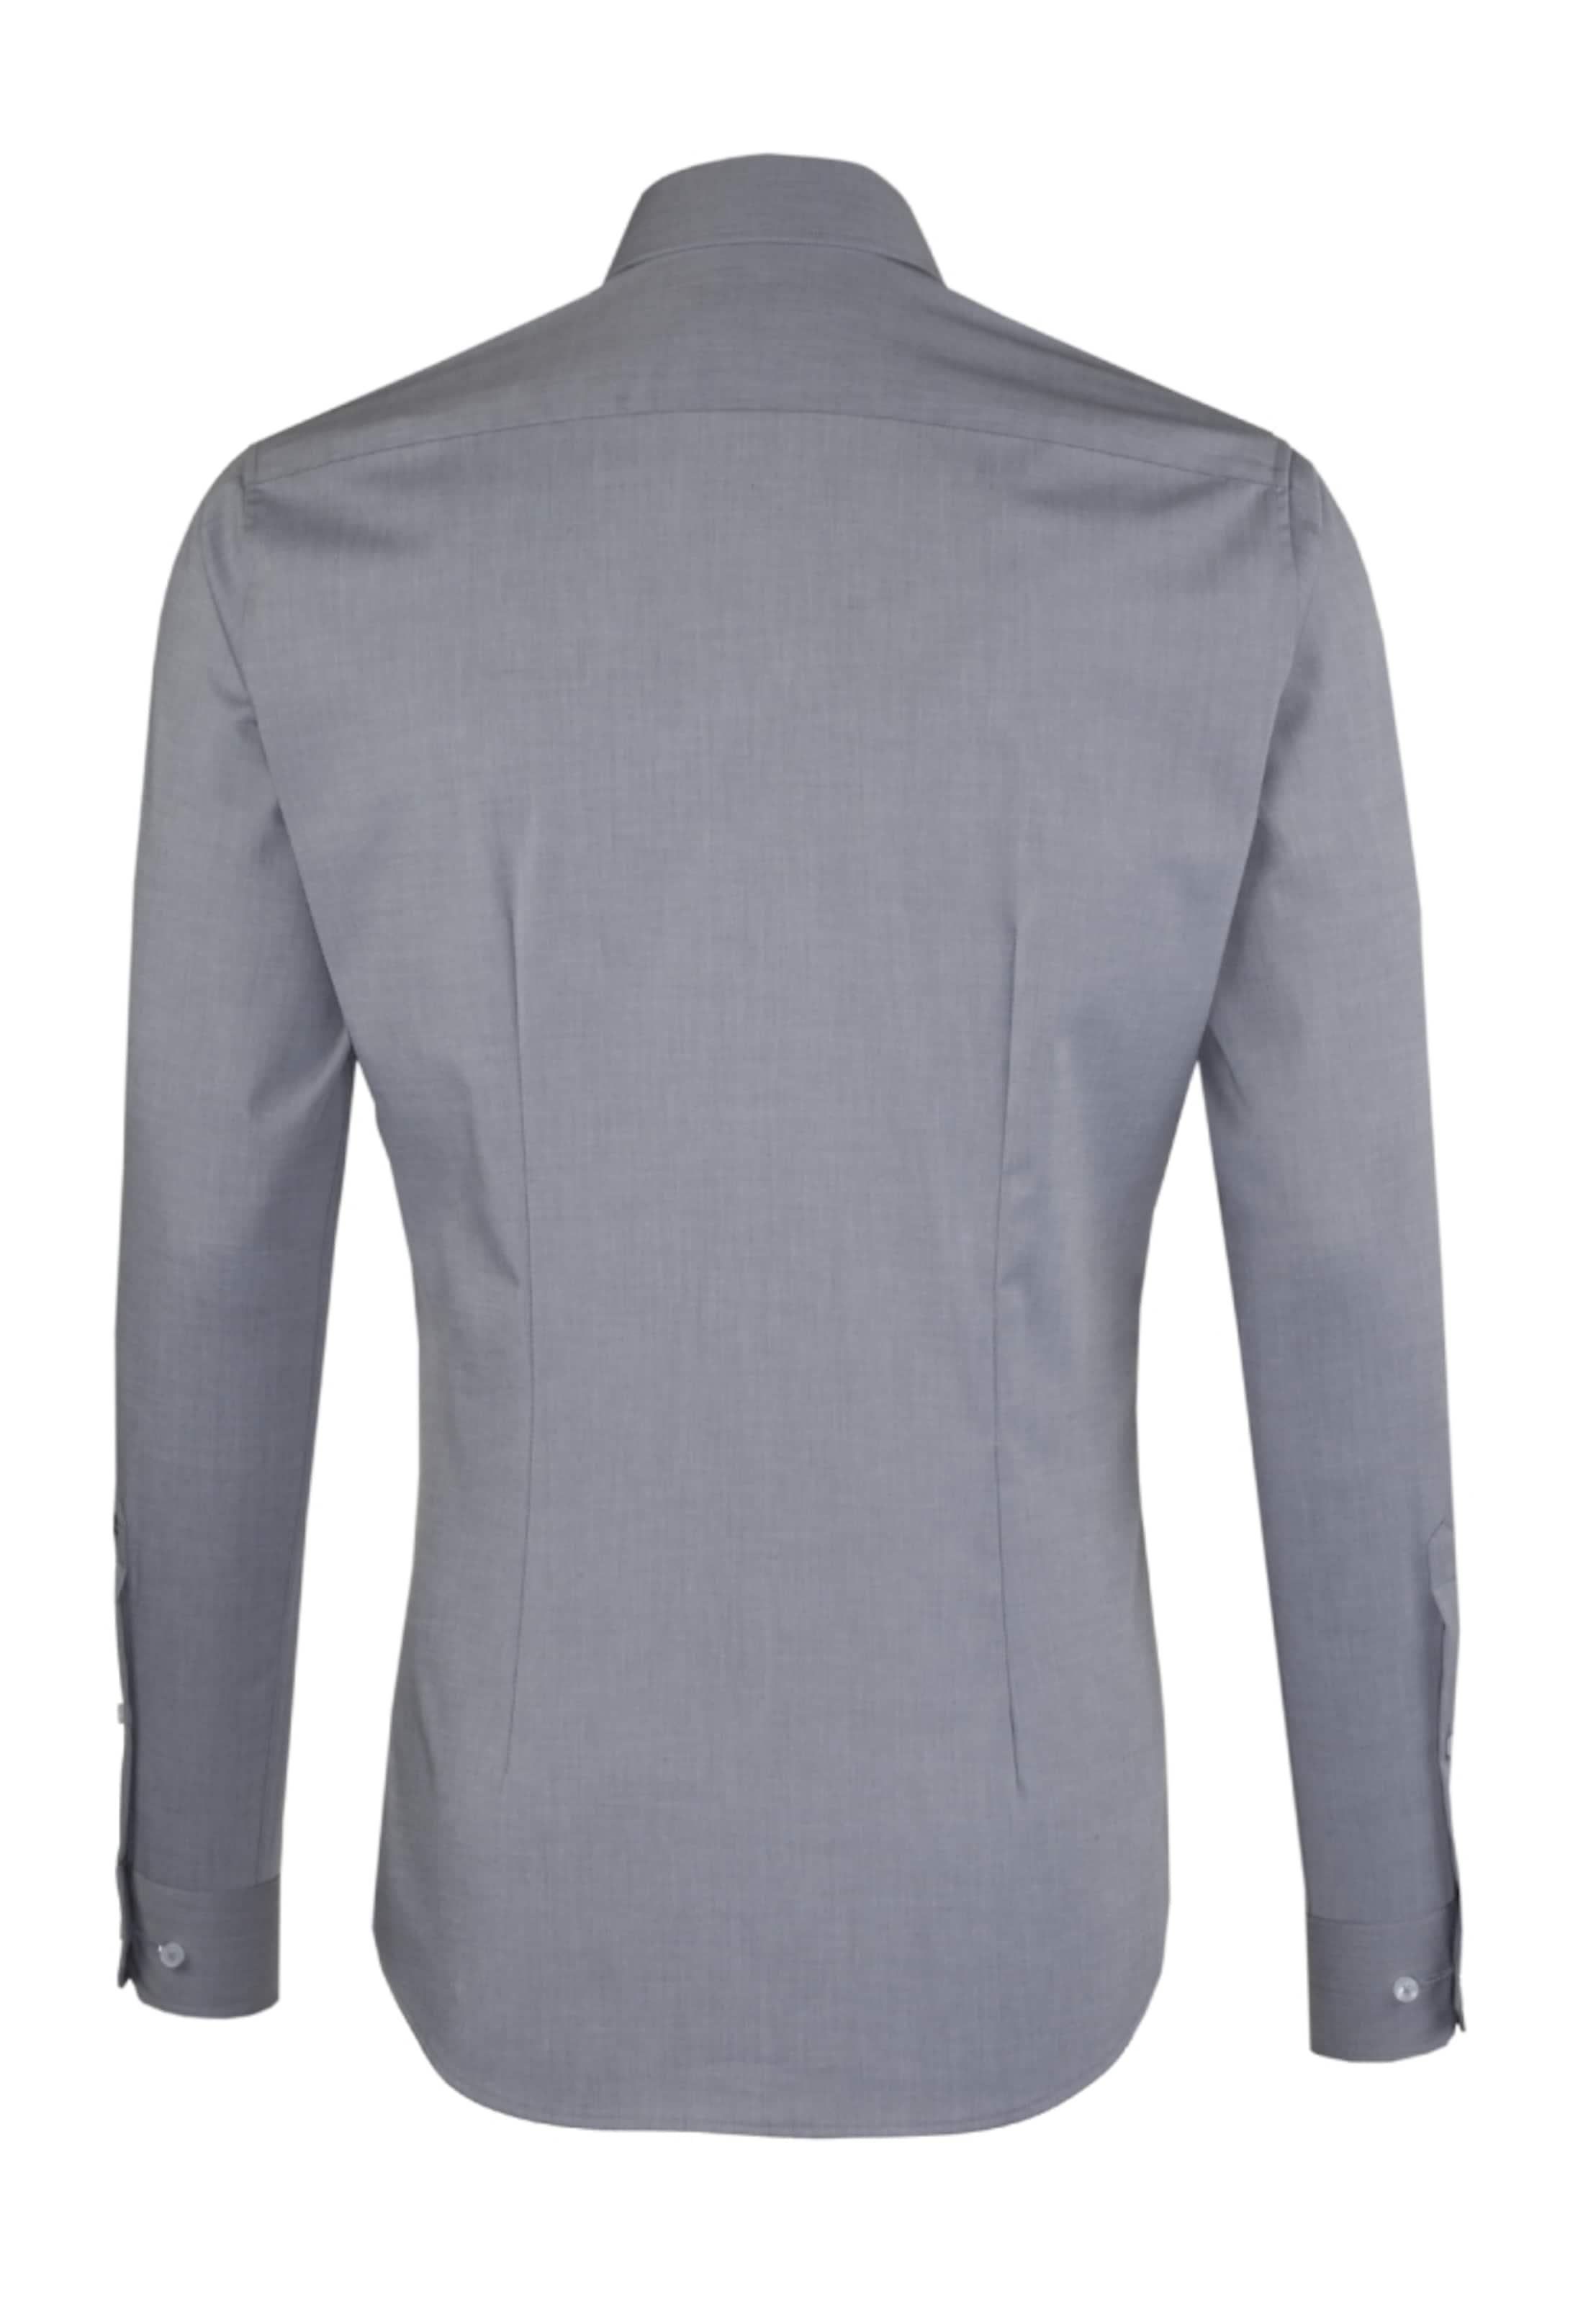 City ' Seidensticker Grau In hemd X slim XuwPZiTOkl